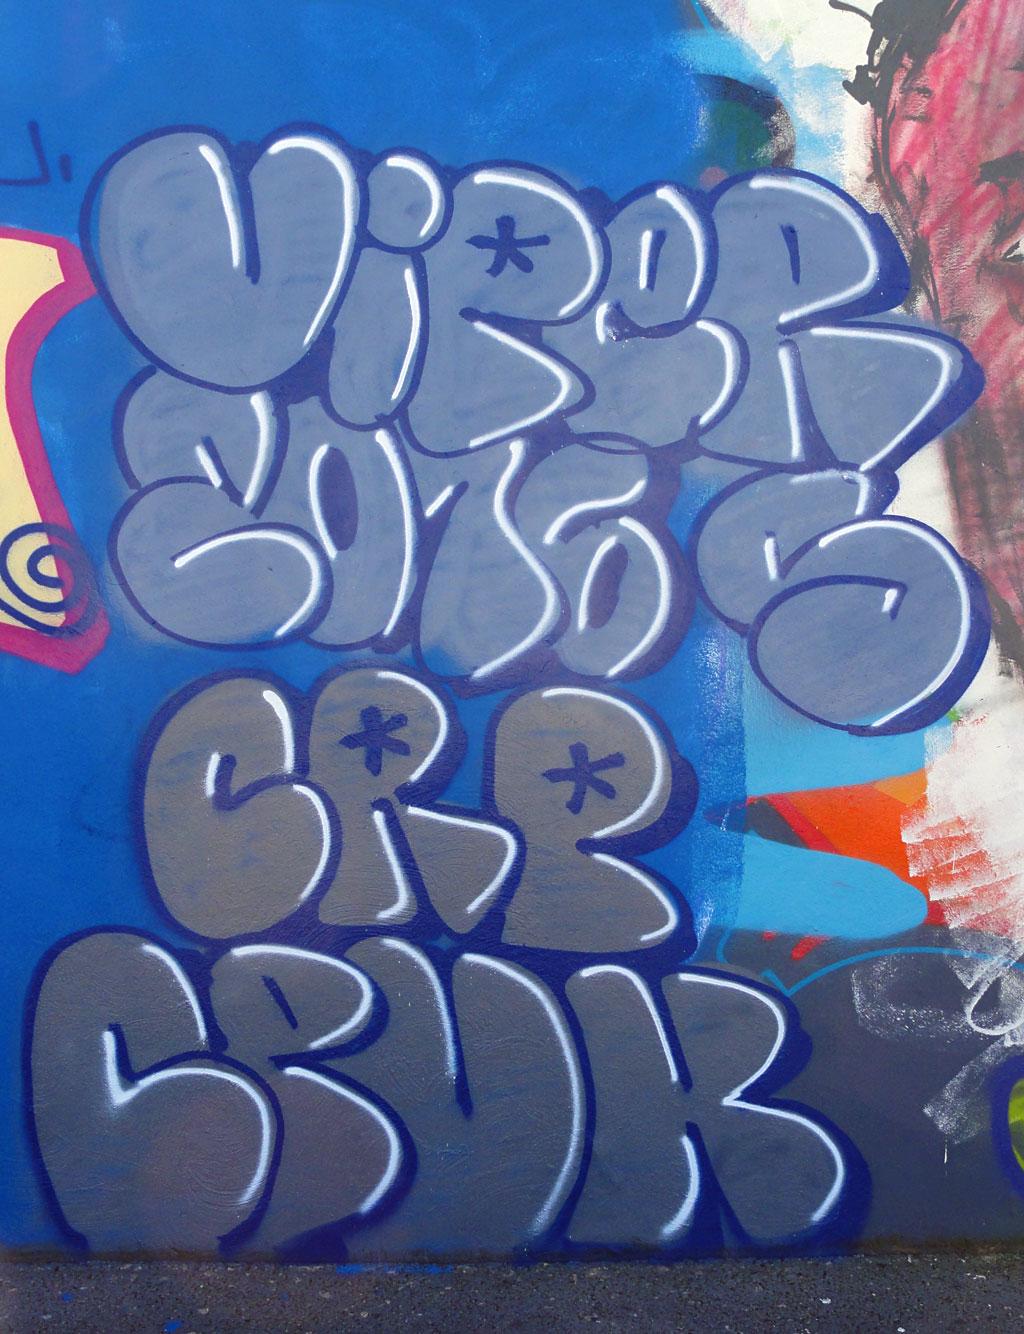 viper-2016-crp-cpuk-hanauer-landstrasse-graffiti-in-frankfurt